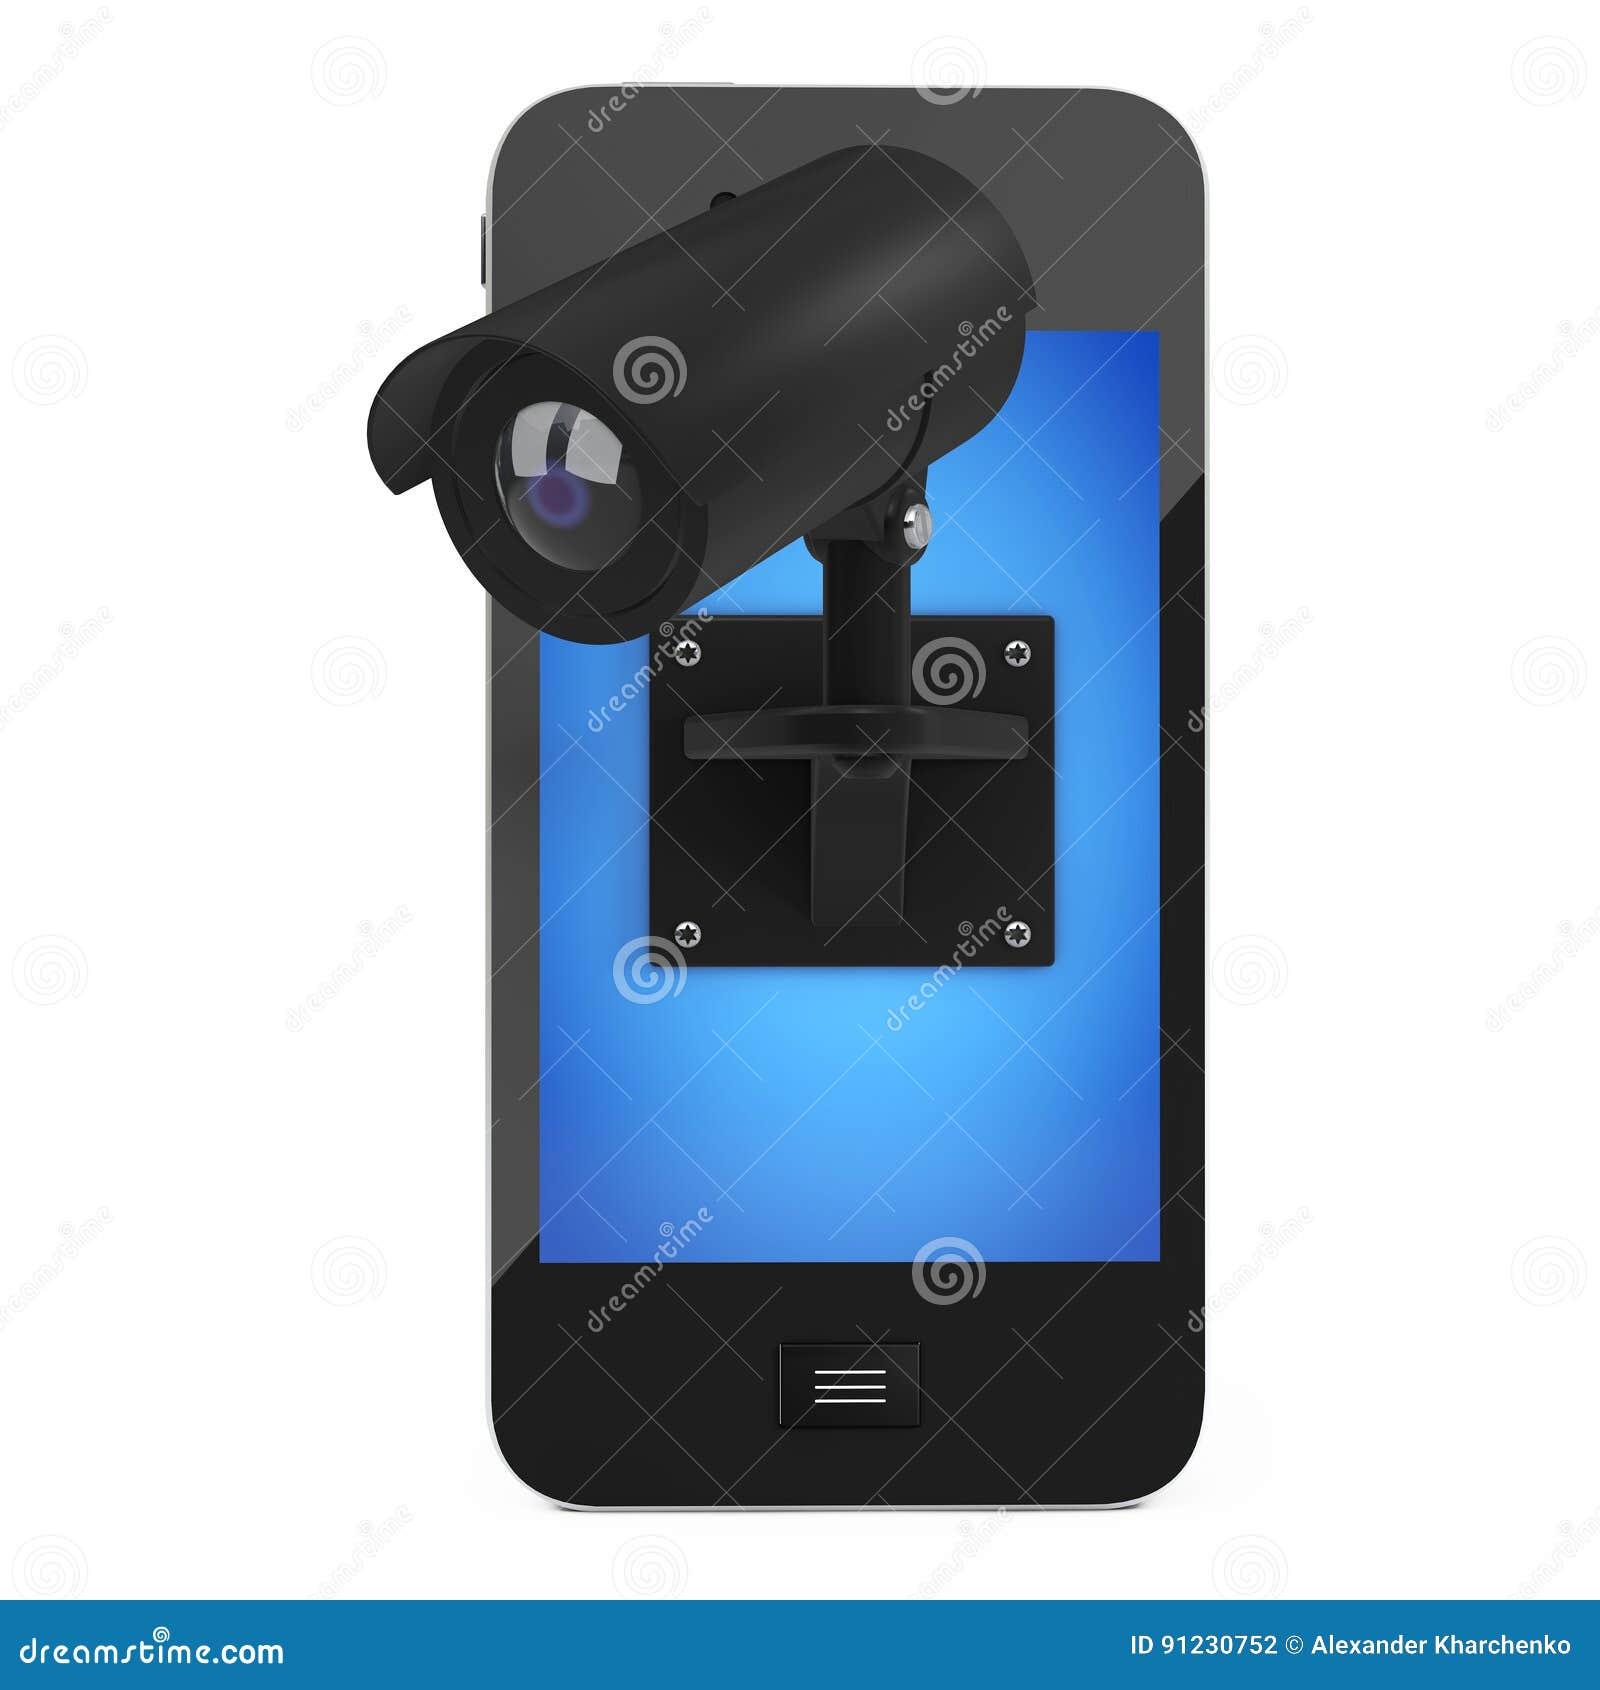 mobile phone with video security surveillance camera 3d renderi stock illustration image. Black Bedroom Furniture Sets. Home Design Ideas